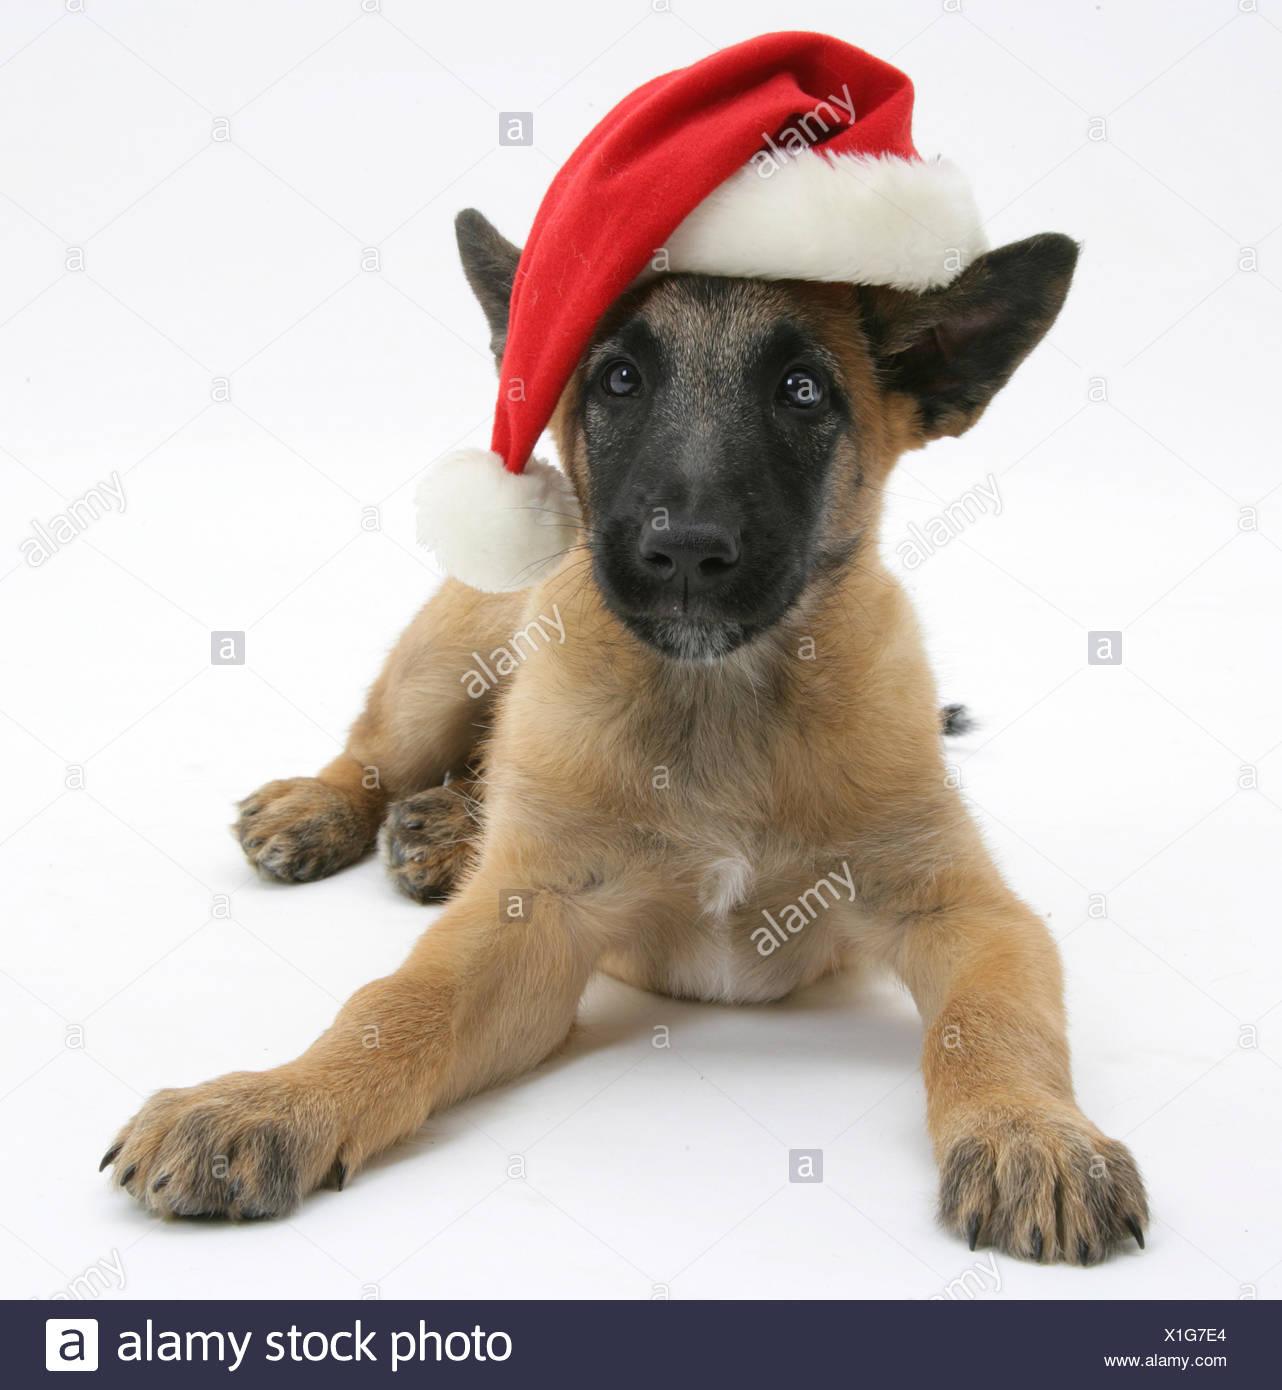 belgischer schäferhund welpen